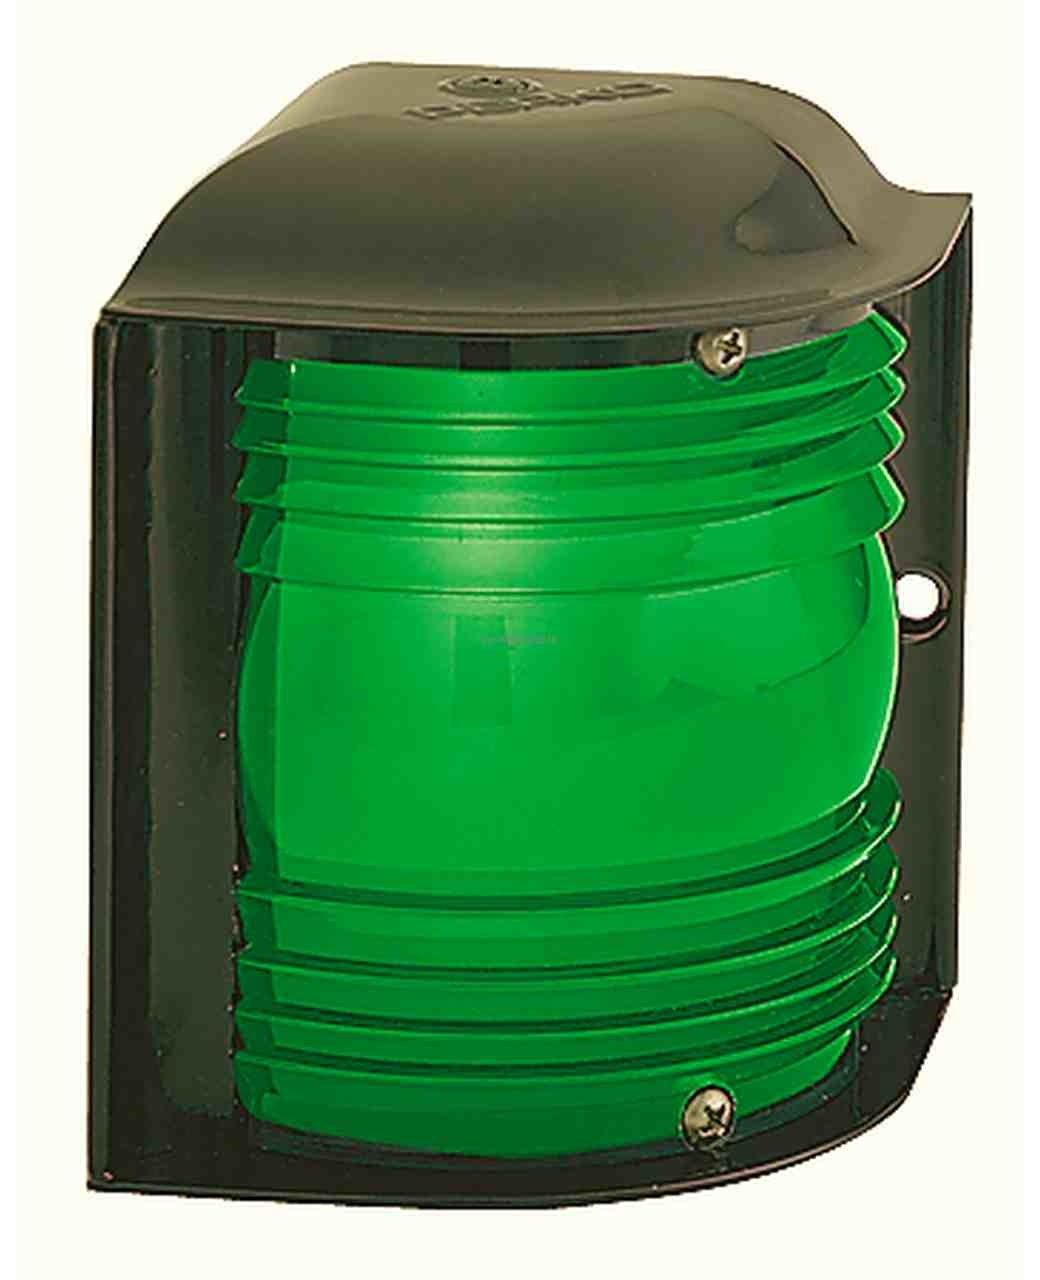 Perko 12 - 24 VDC Luz lateral verde - montaje horizontal (bombilla no incluida)